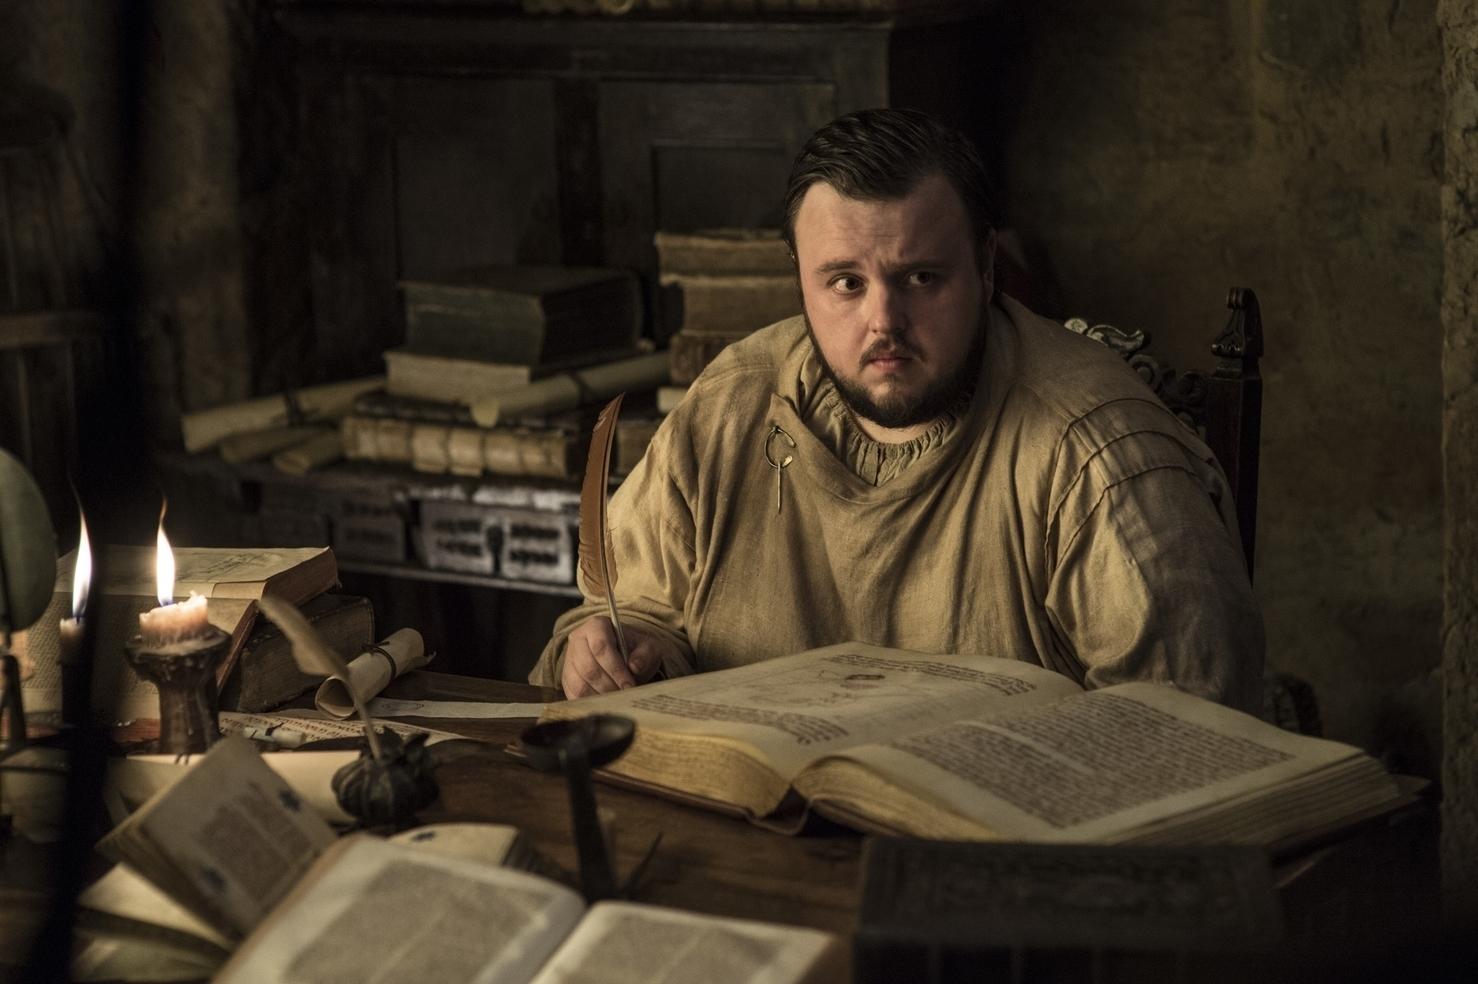 Game of Thrones Season 7 Finale Trailer Arrives: Jon Snow Faces Cersei